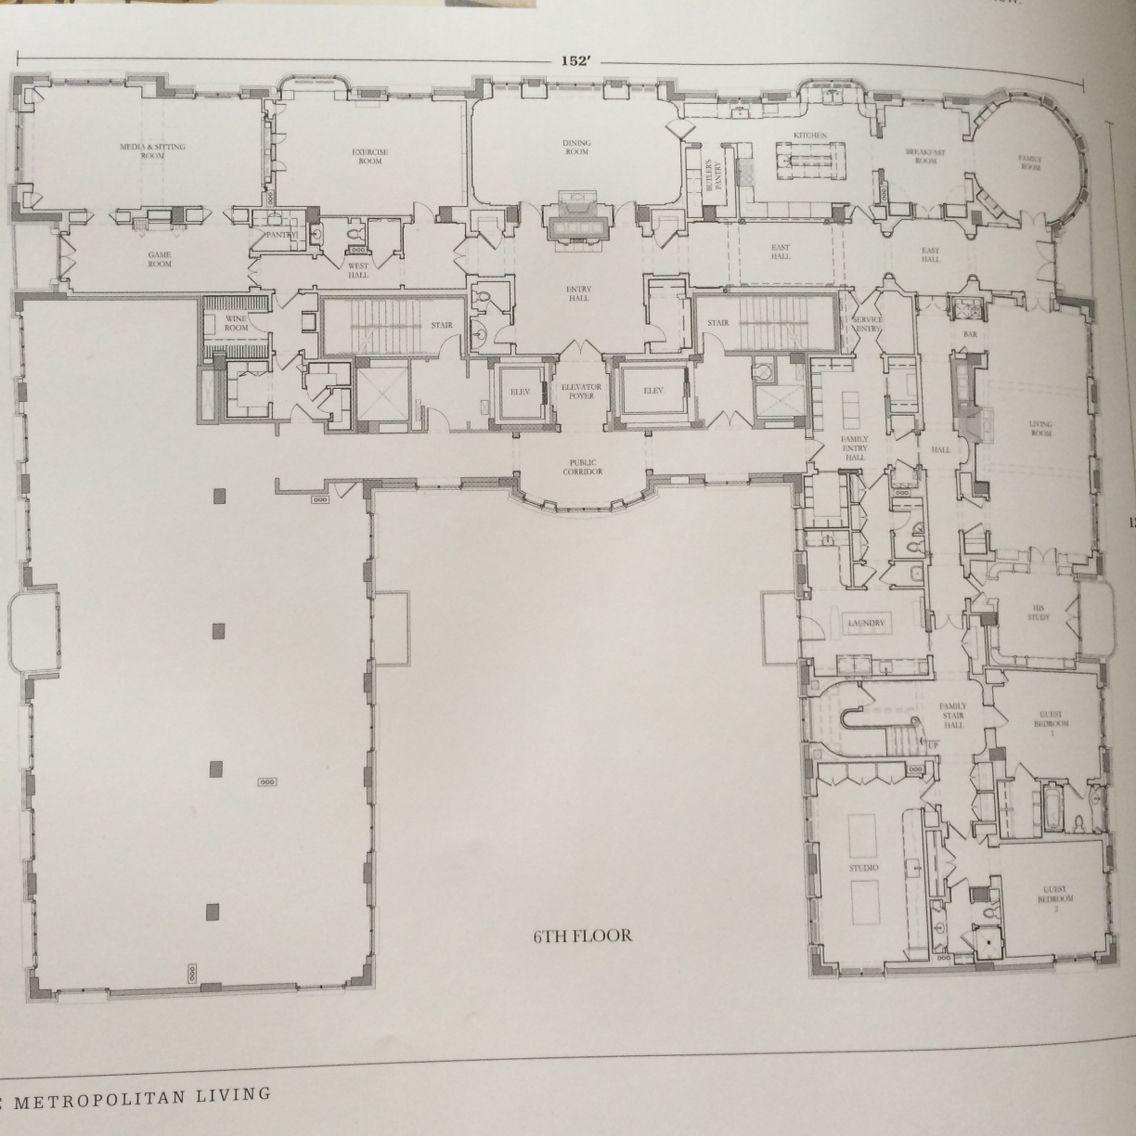 65 goethe mansion floor plan floor plans pinterest